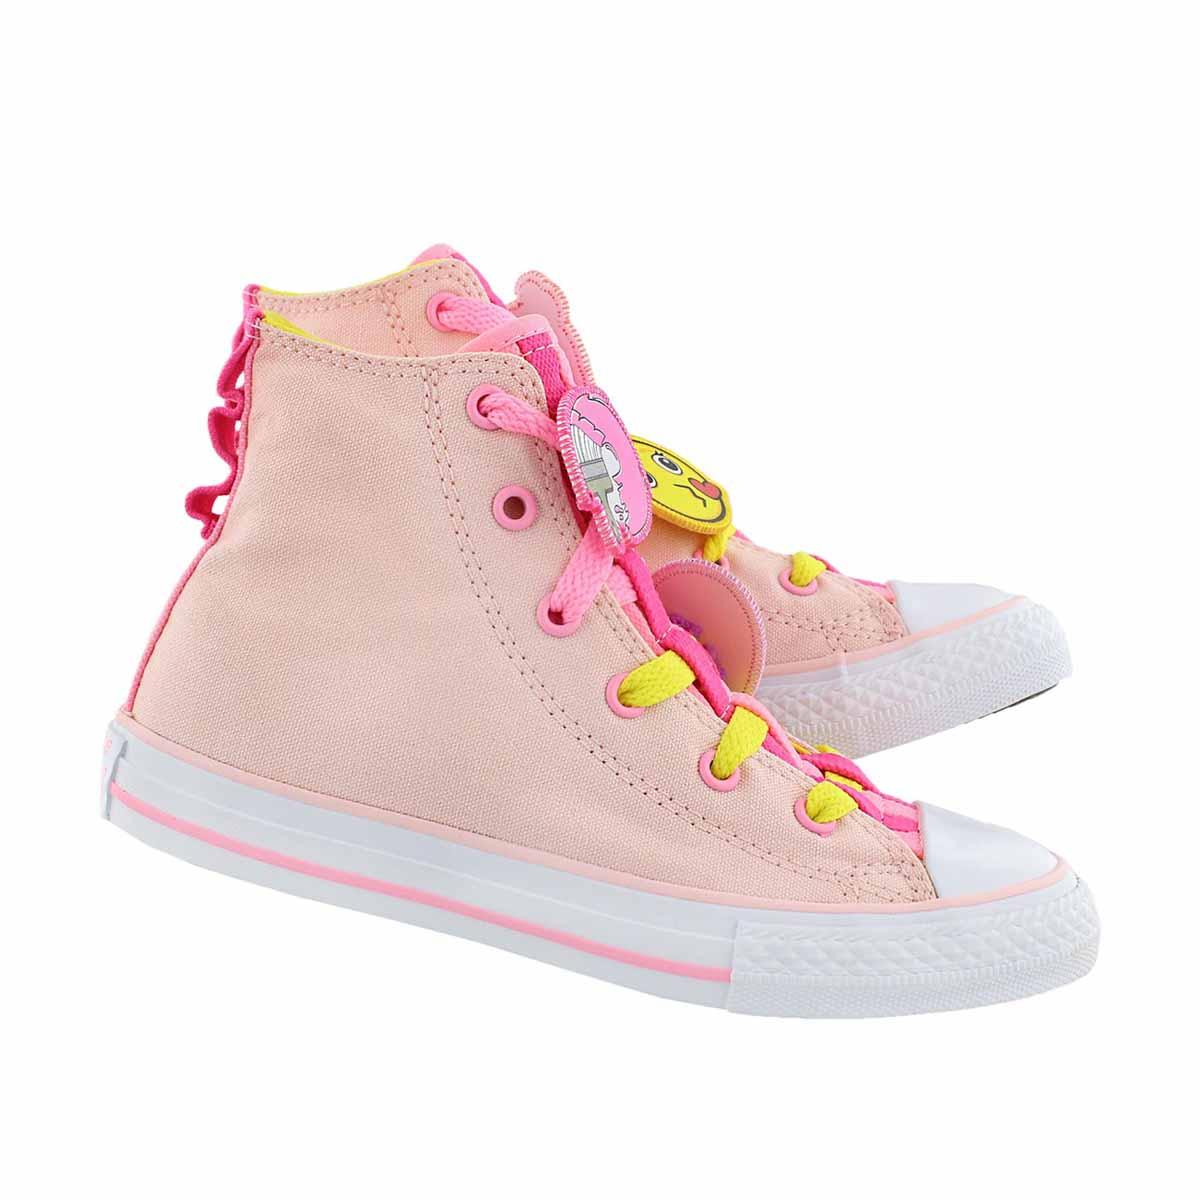 15867bf5f5f2 Converse Girl s Chuck Taylor All Star Loopholes Emoji High Top Sneaker